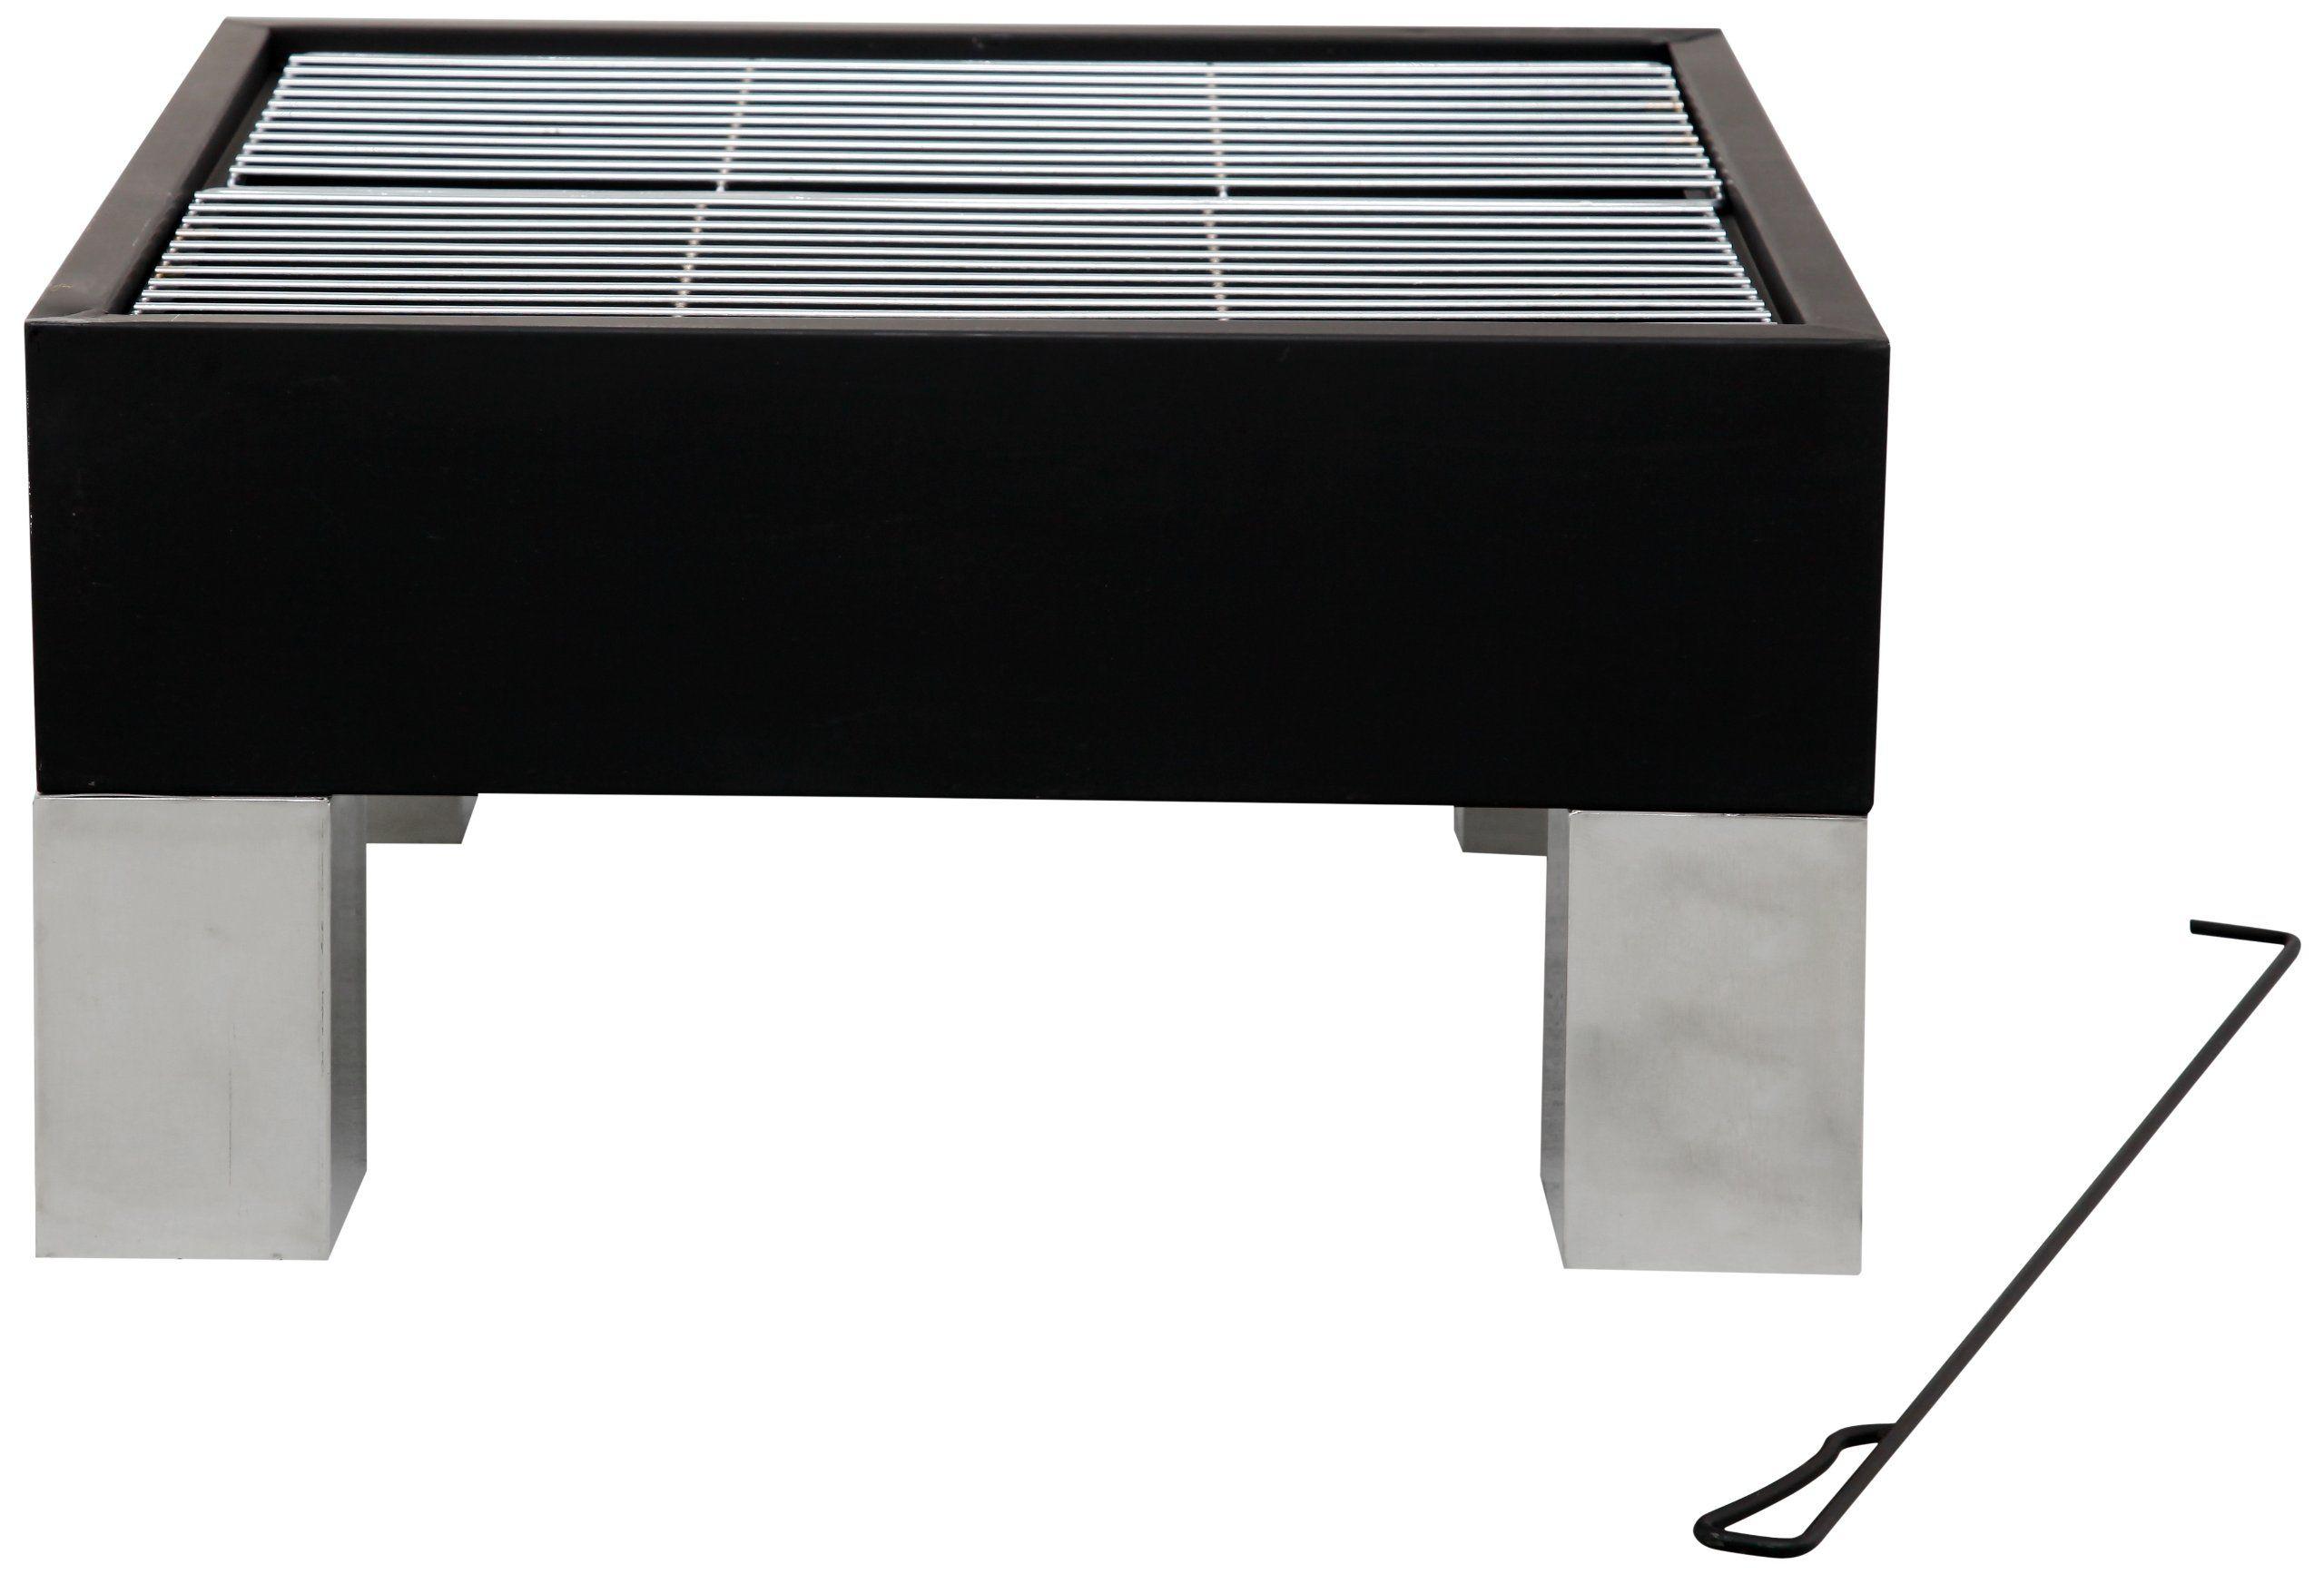 Tepro 40002 Design Feuerstelle Quot Burbank Quot Mit Funkengitter Eckig Feuerstelle Gitter Design